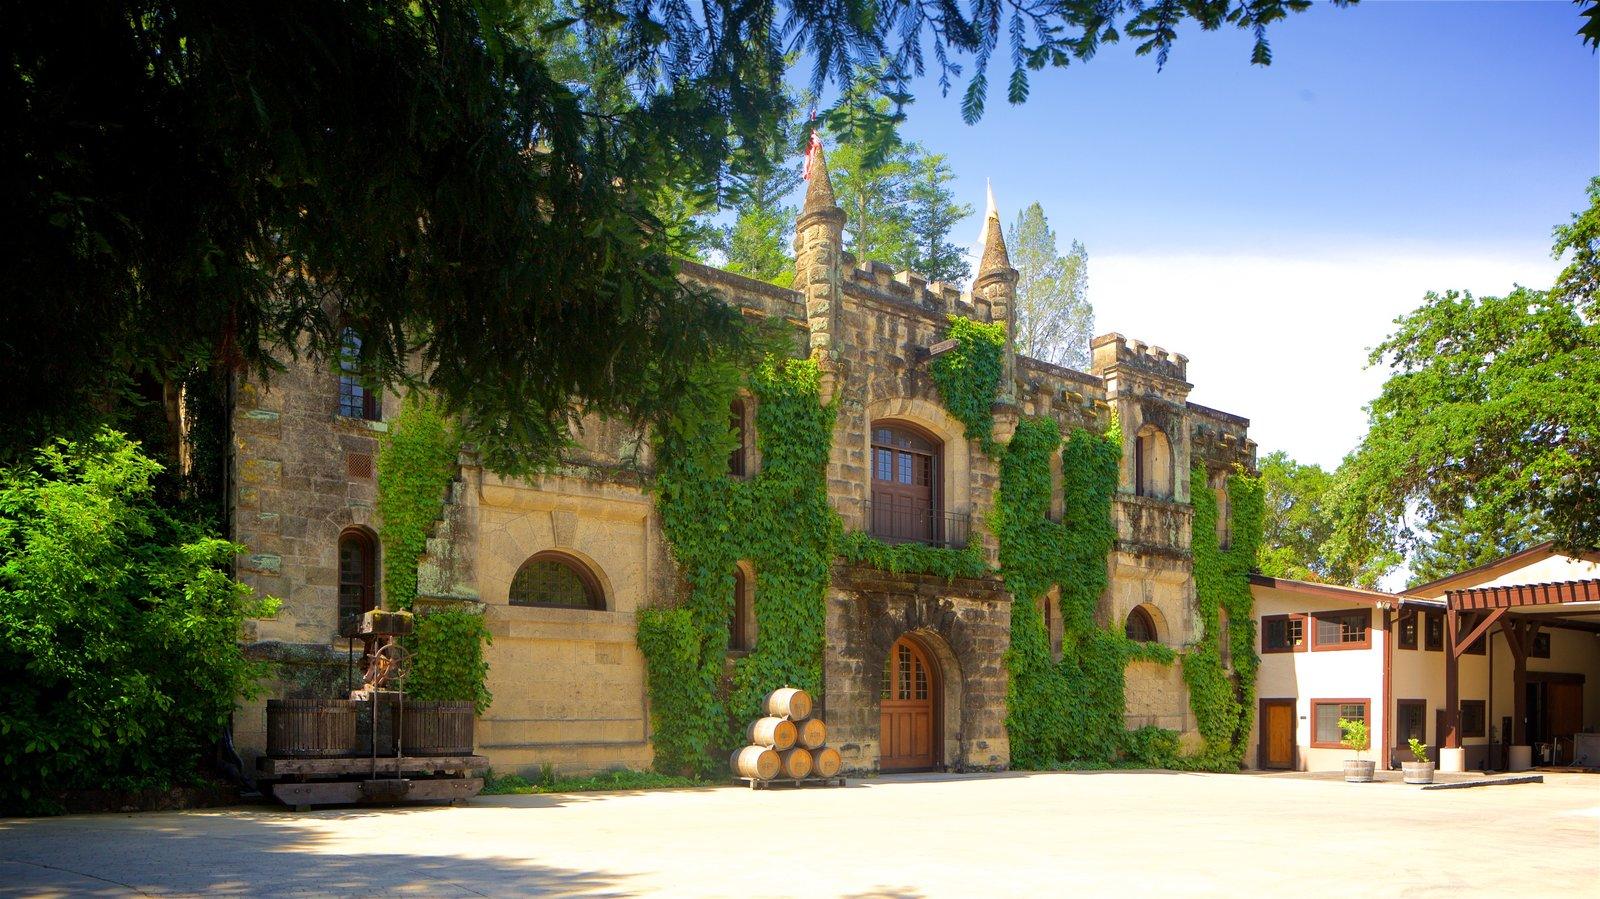 Chateau Montelena Winery mostrando elementos del patrimonio